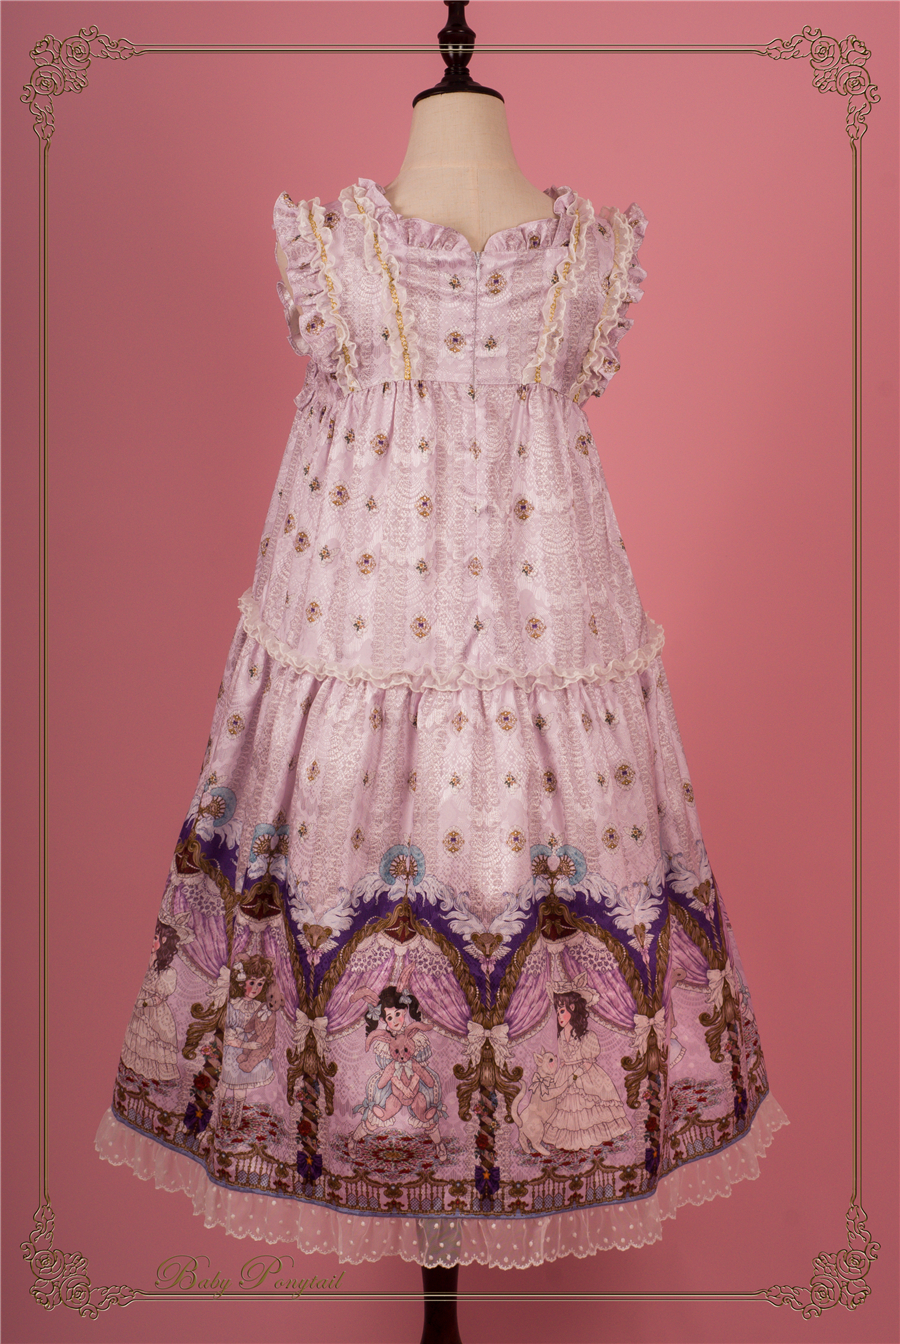 BabyPonytail_Stock Photo_My Favorite Companion_NG Lavender_6.jpg